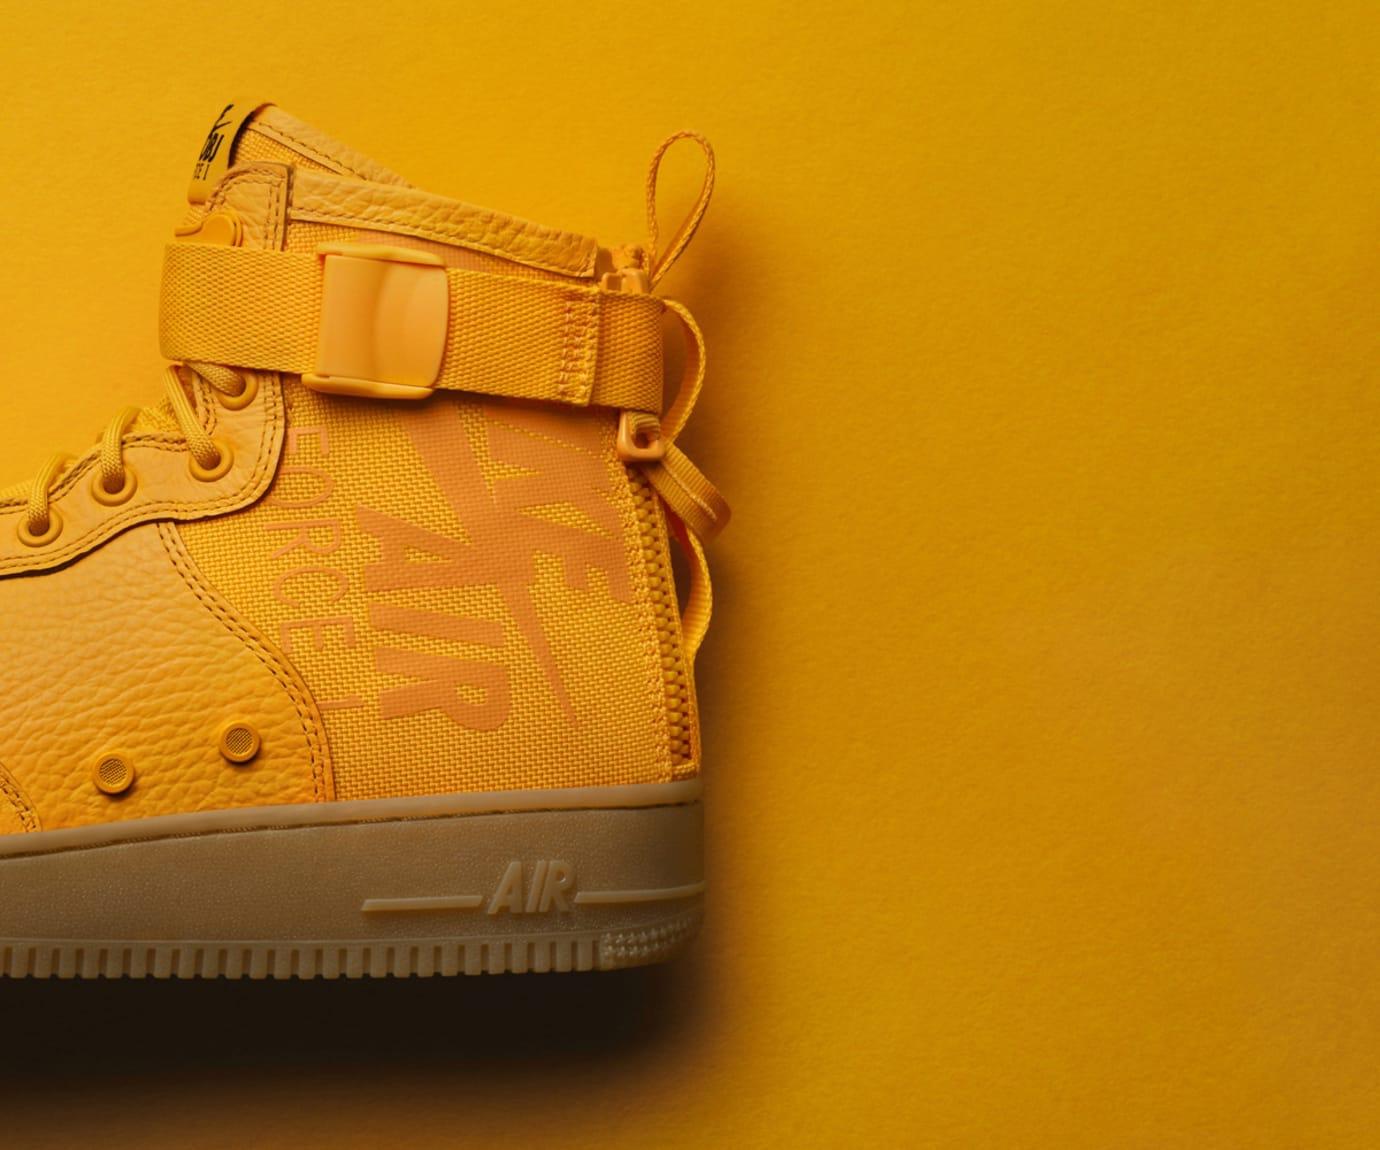 Odell Beckham Jr Nike Air Force 1 OBJ Heel